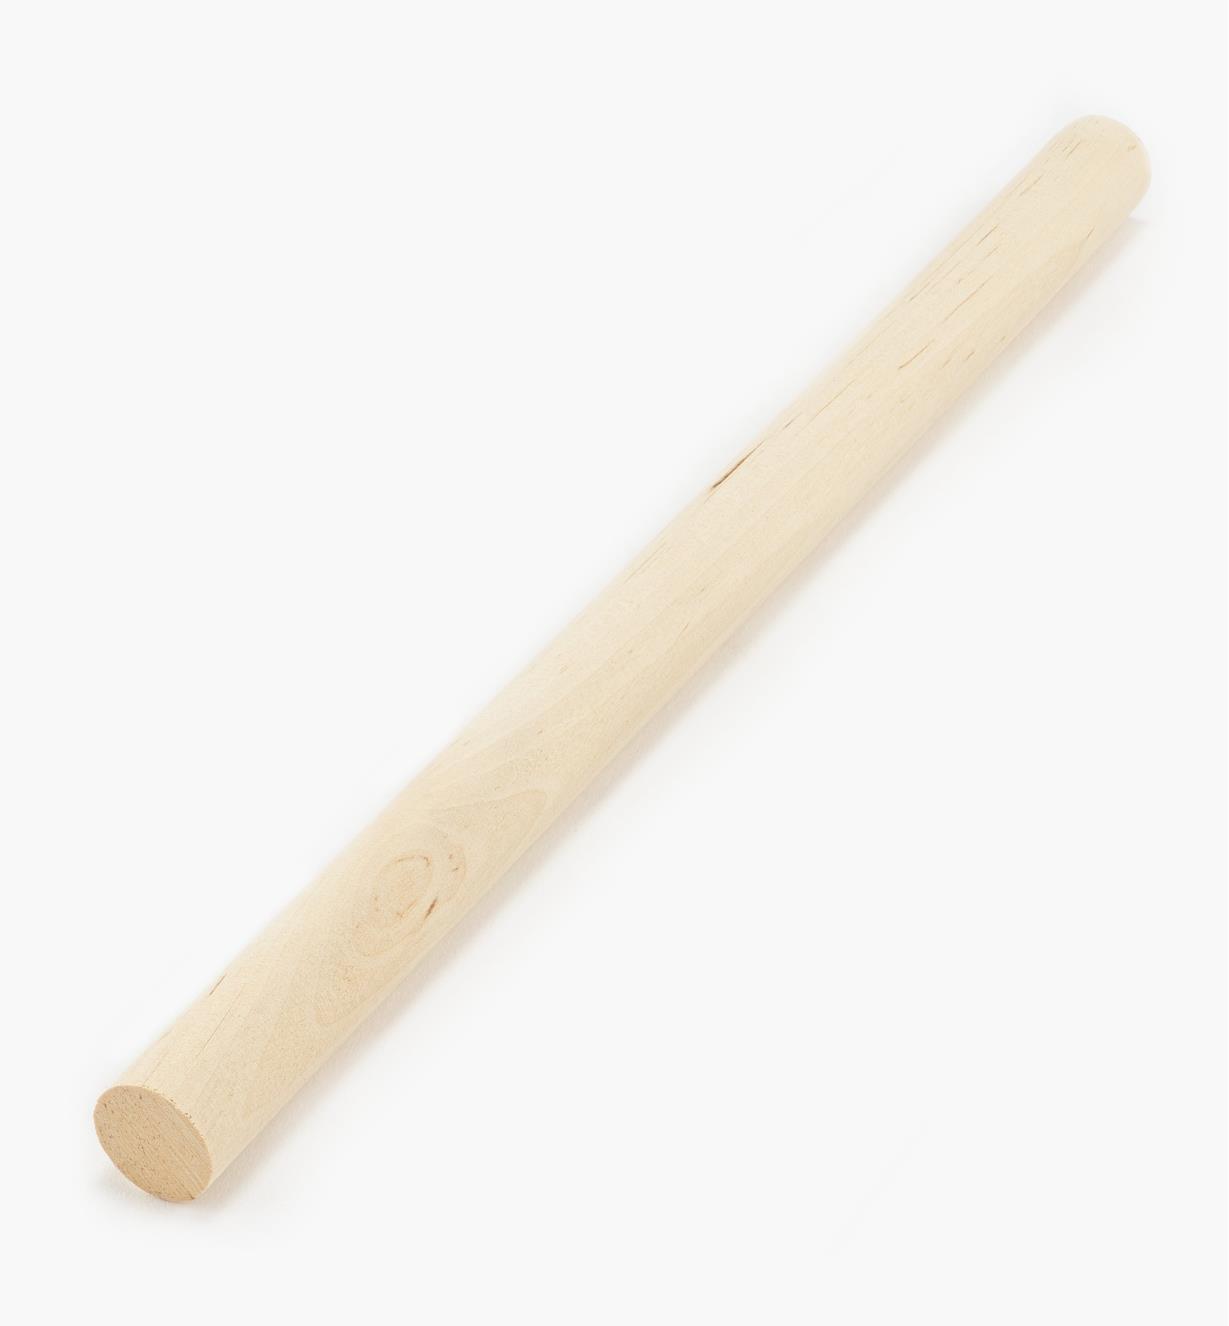 41K3006 - Goujon en bois dur de 3/4pox1pi